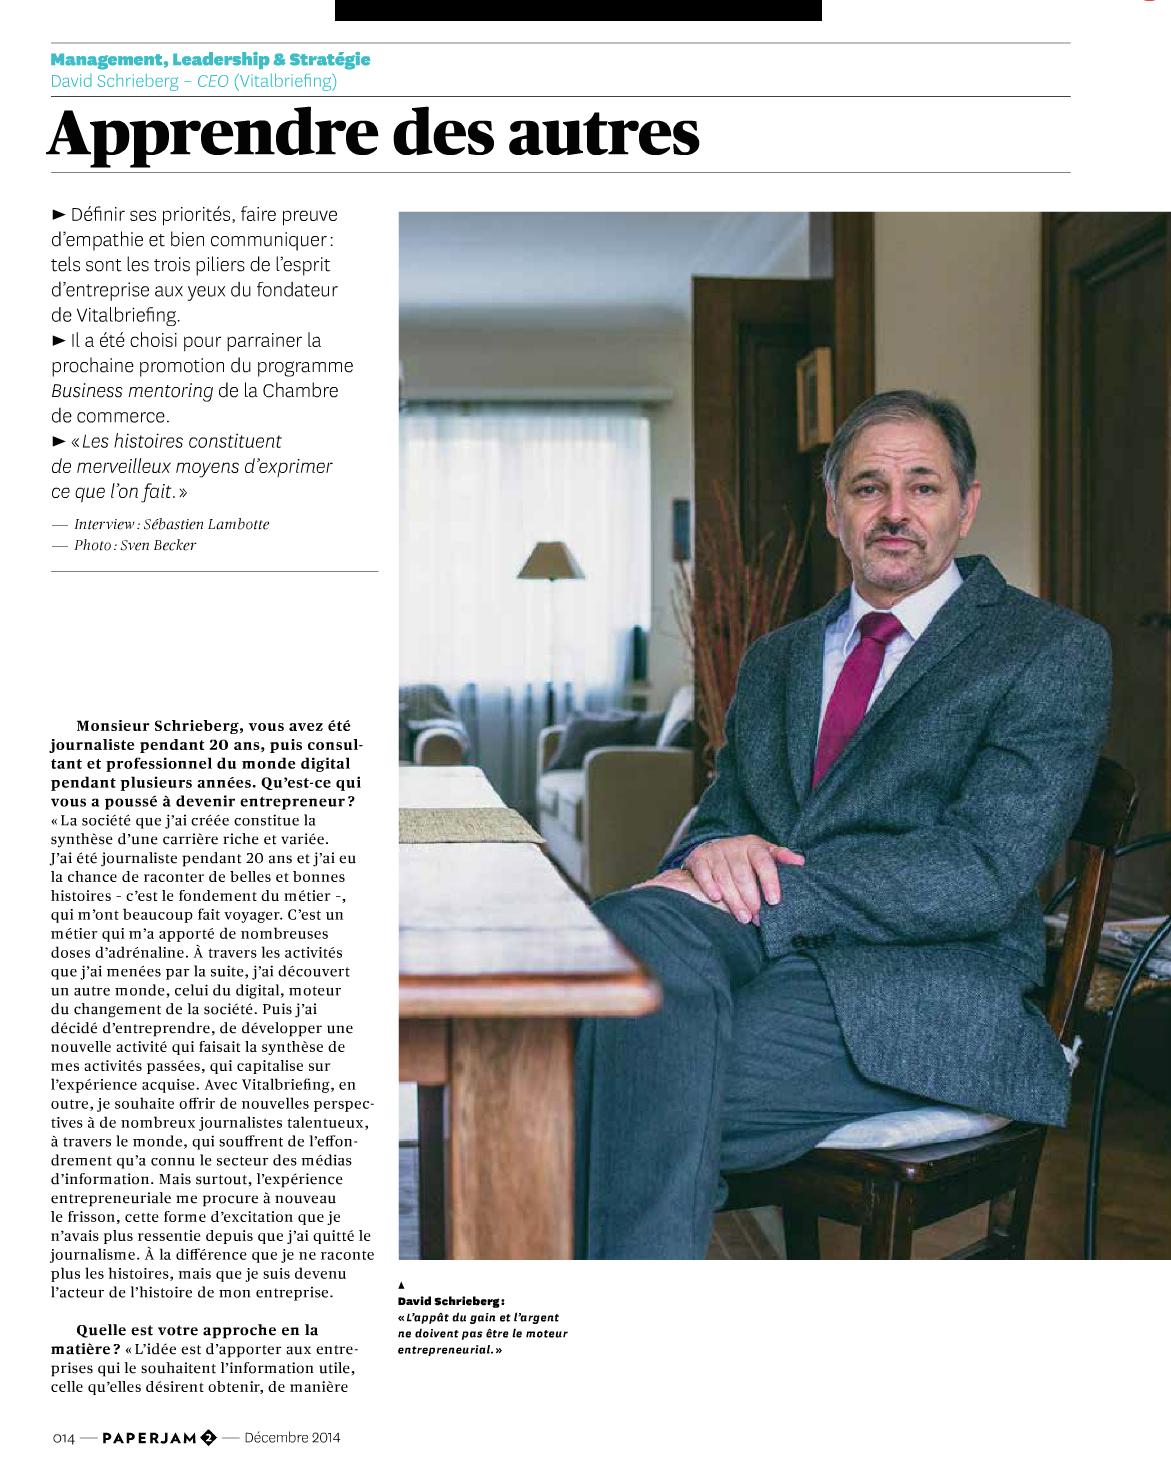 David Schrieberg article